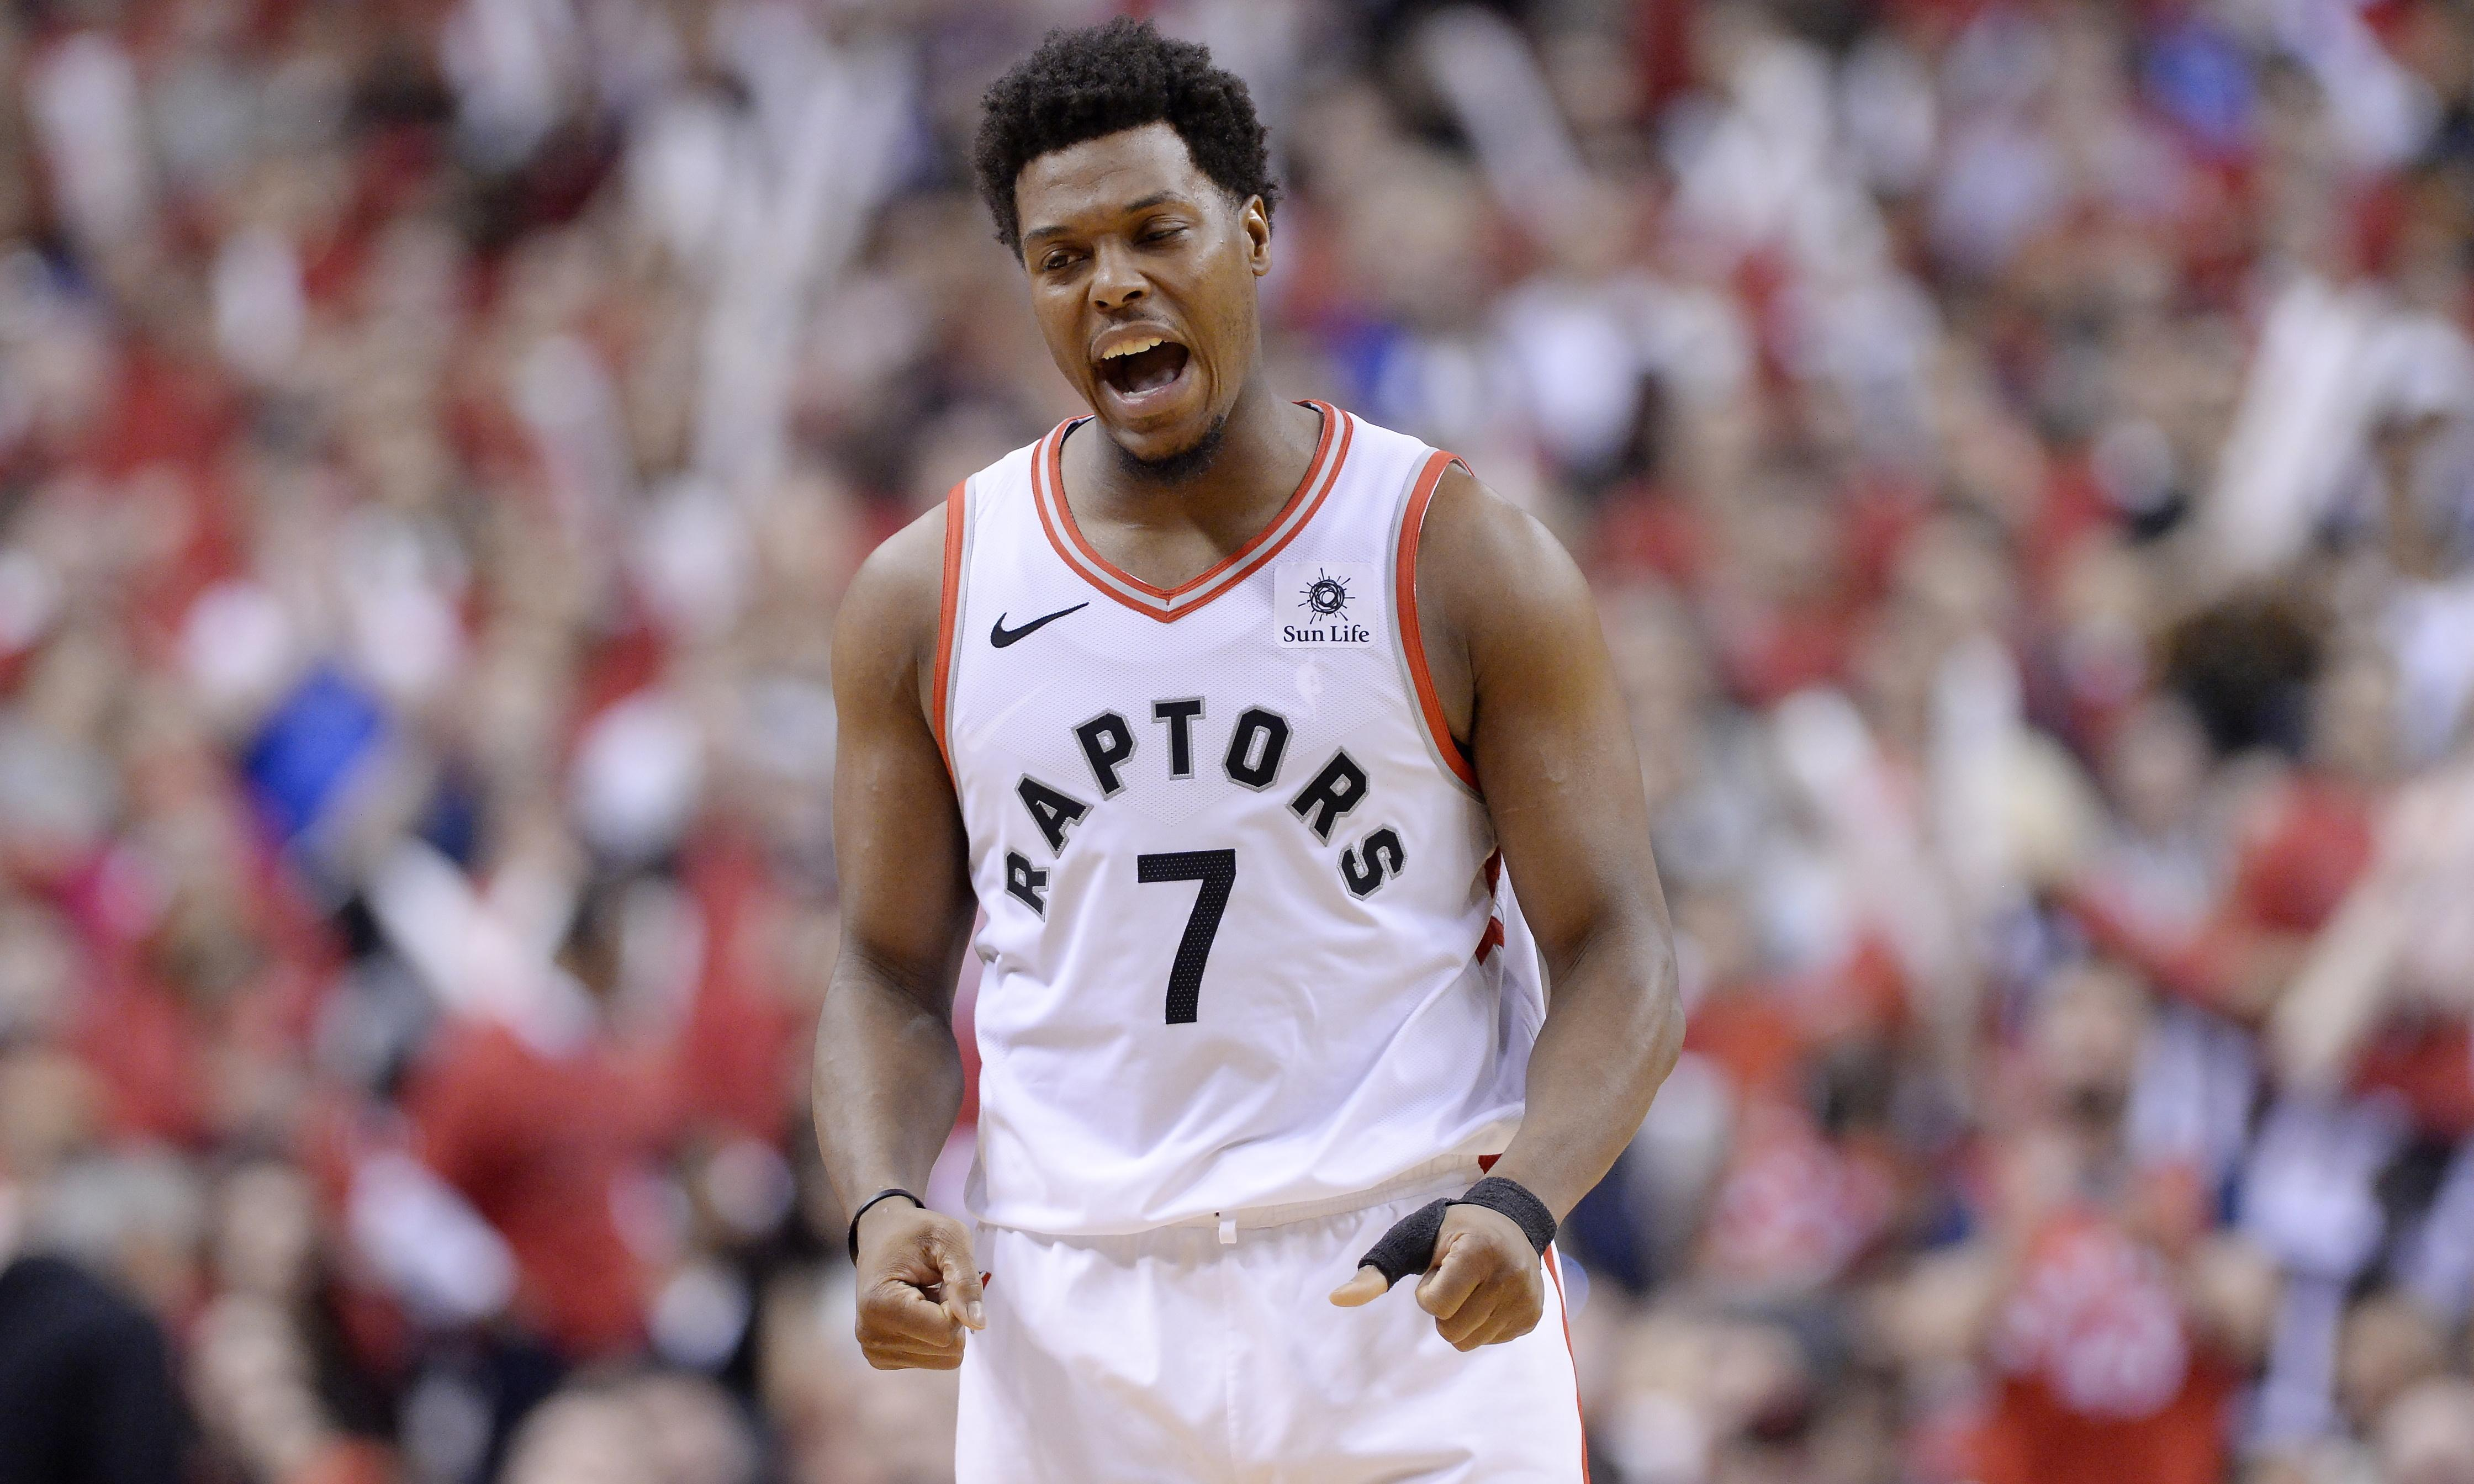 NBA playoffs: Raptors strike back against Bucks in double-overtime thriller